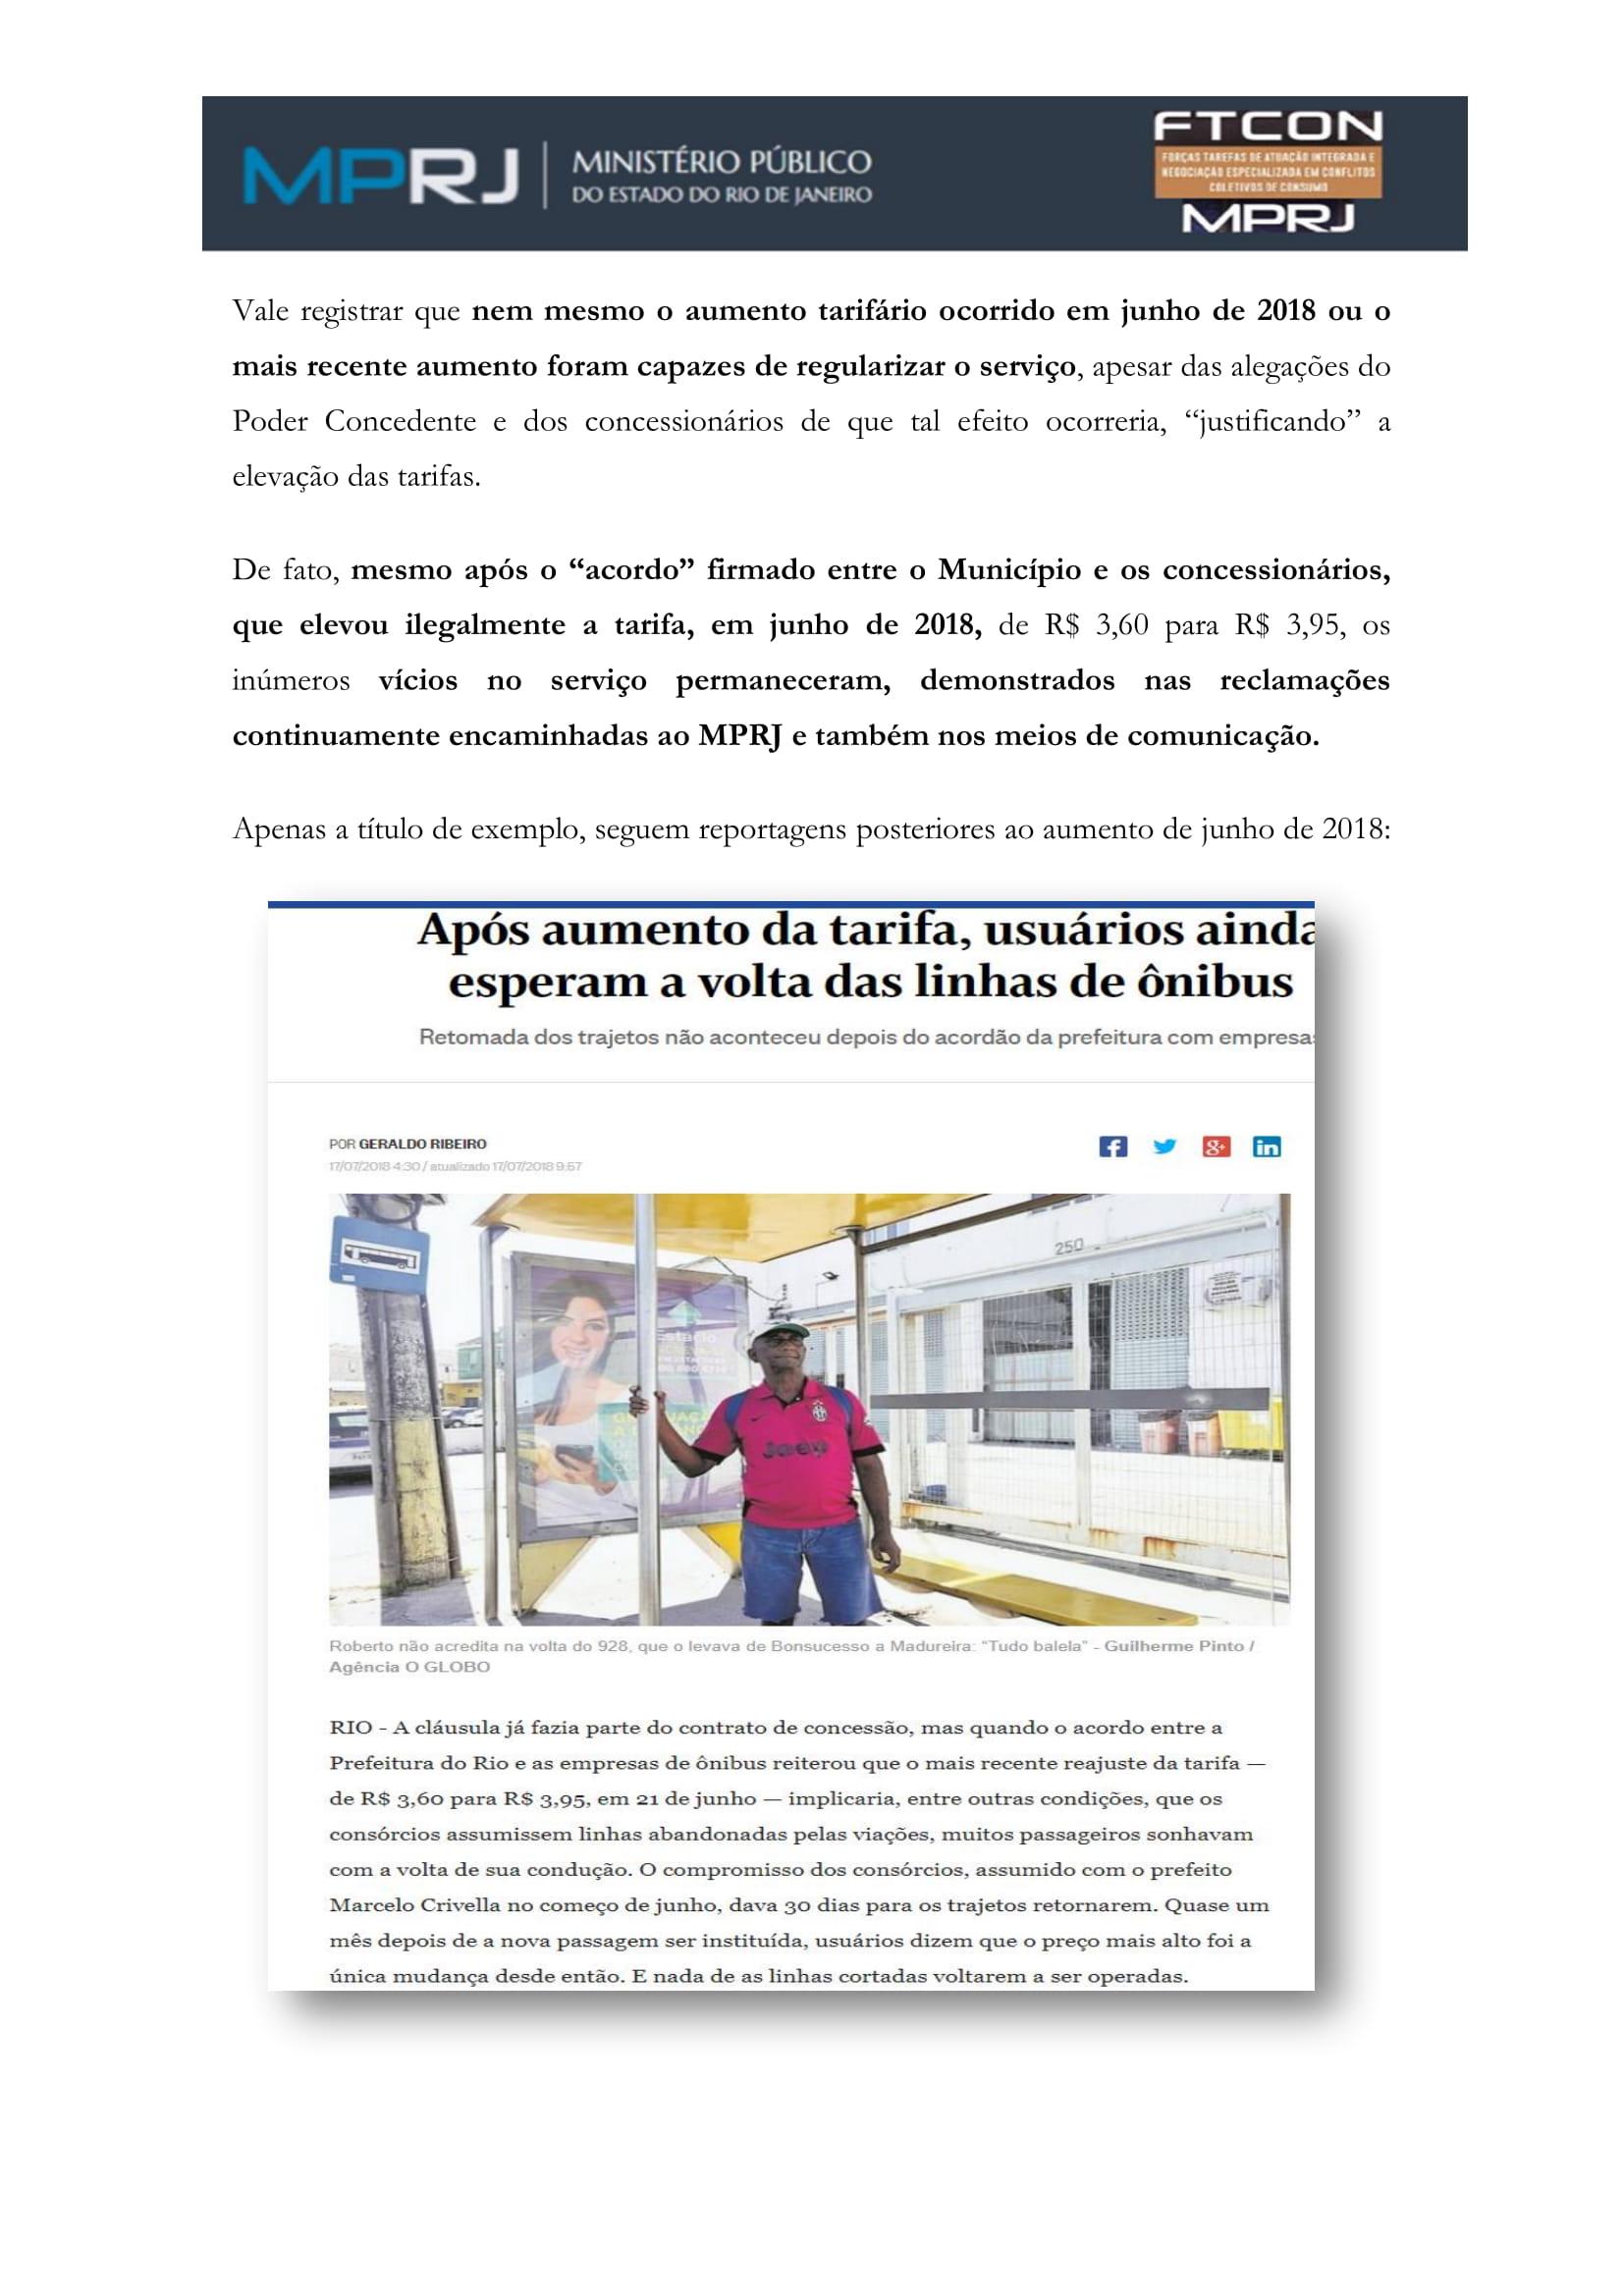 acp_caducidade_onibus_dr_rt-034